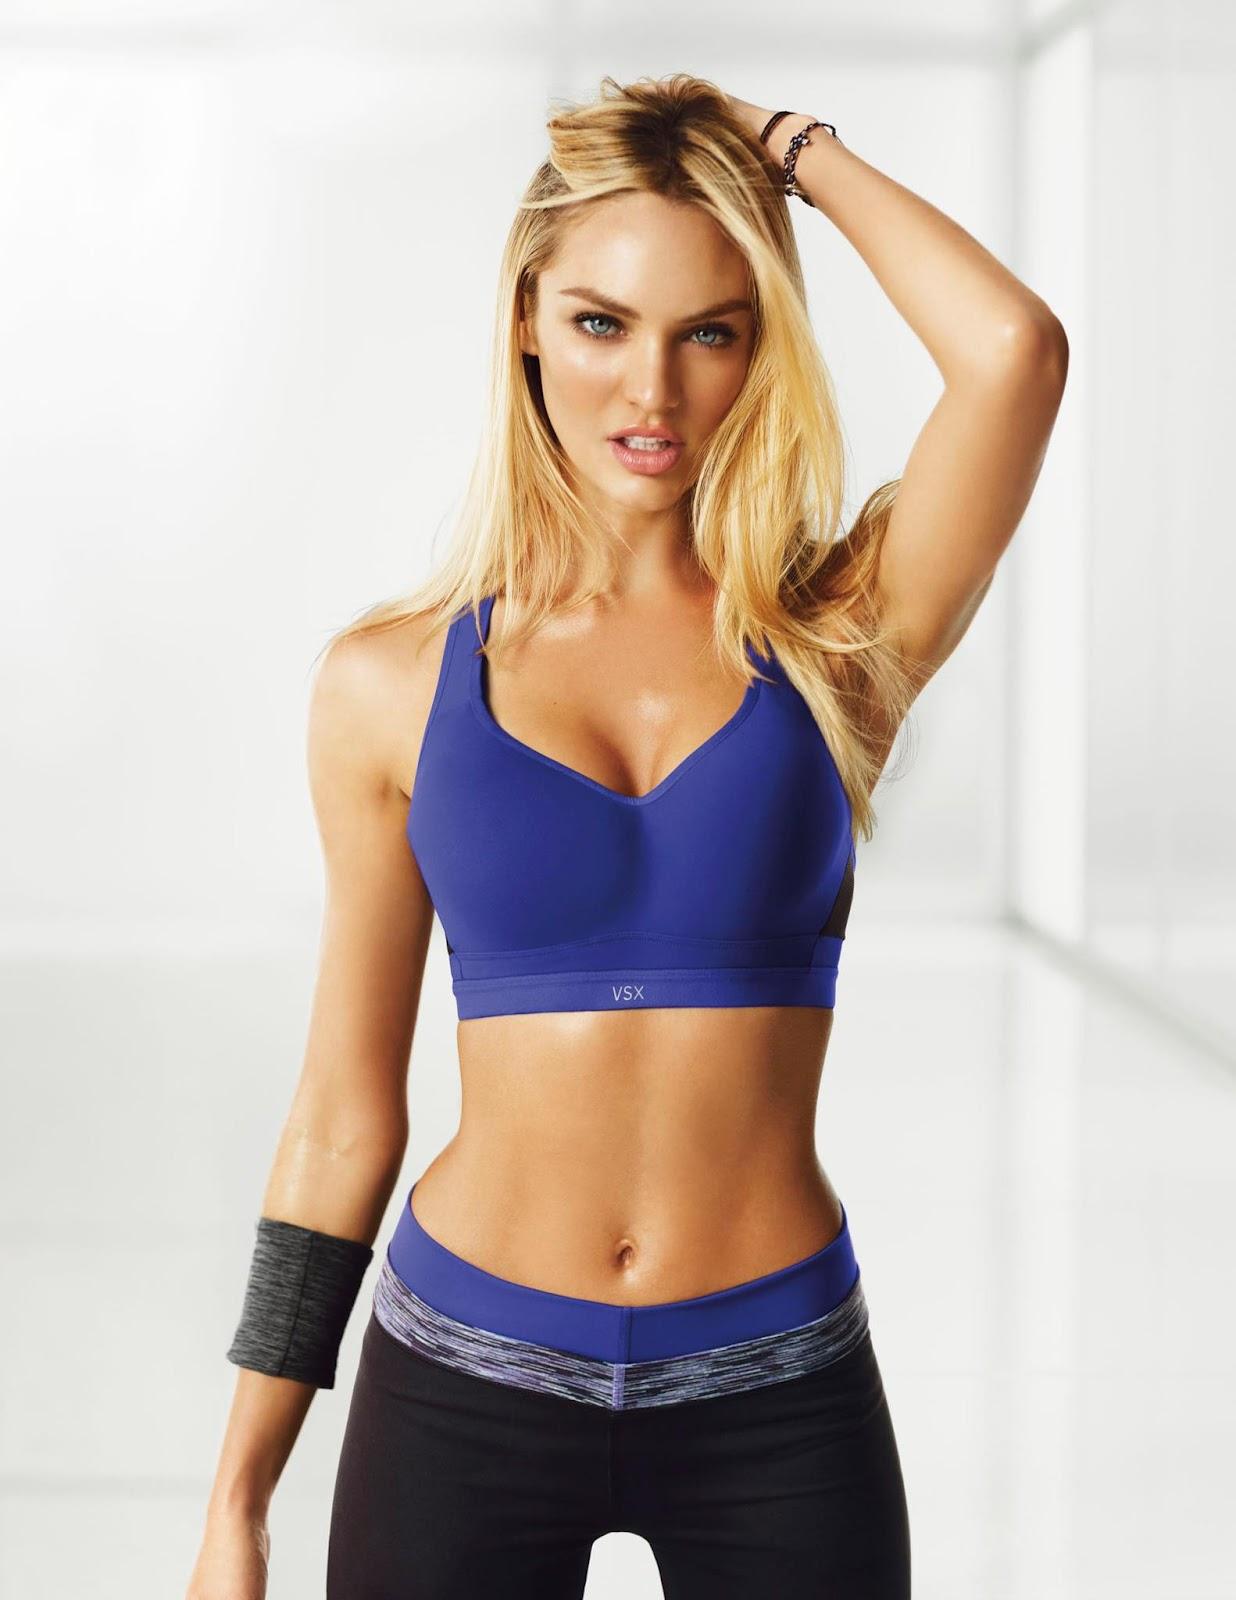 Candice Swanepoel Yoga Pants